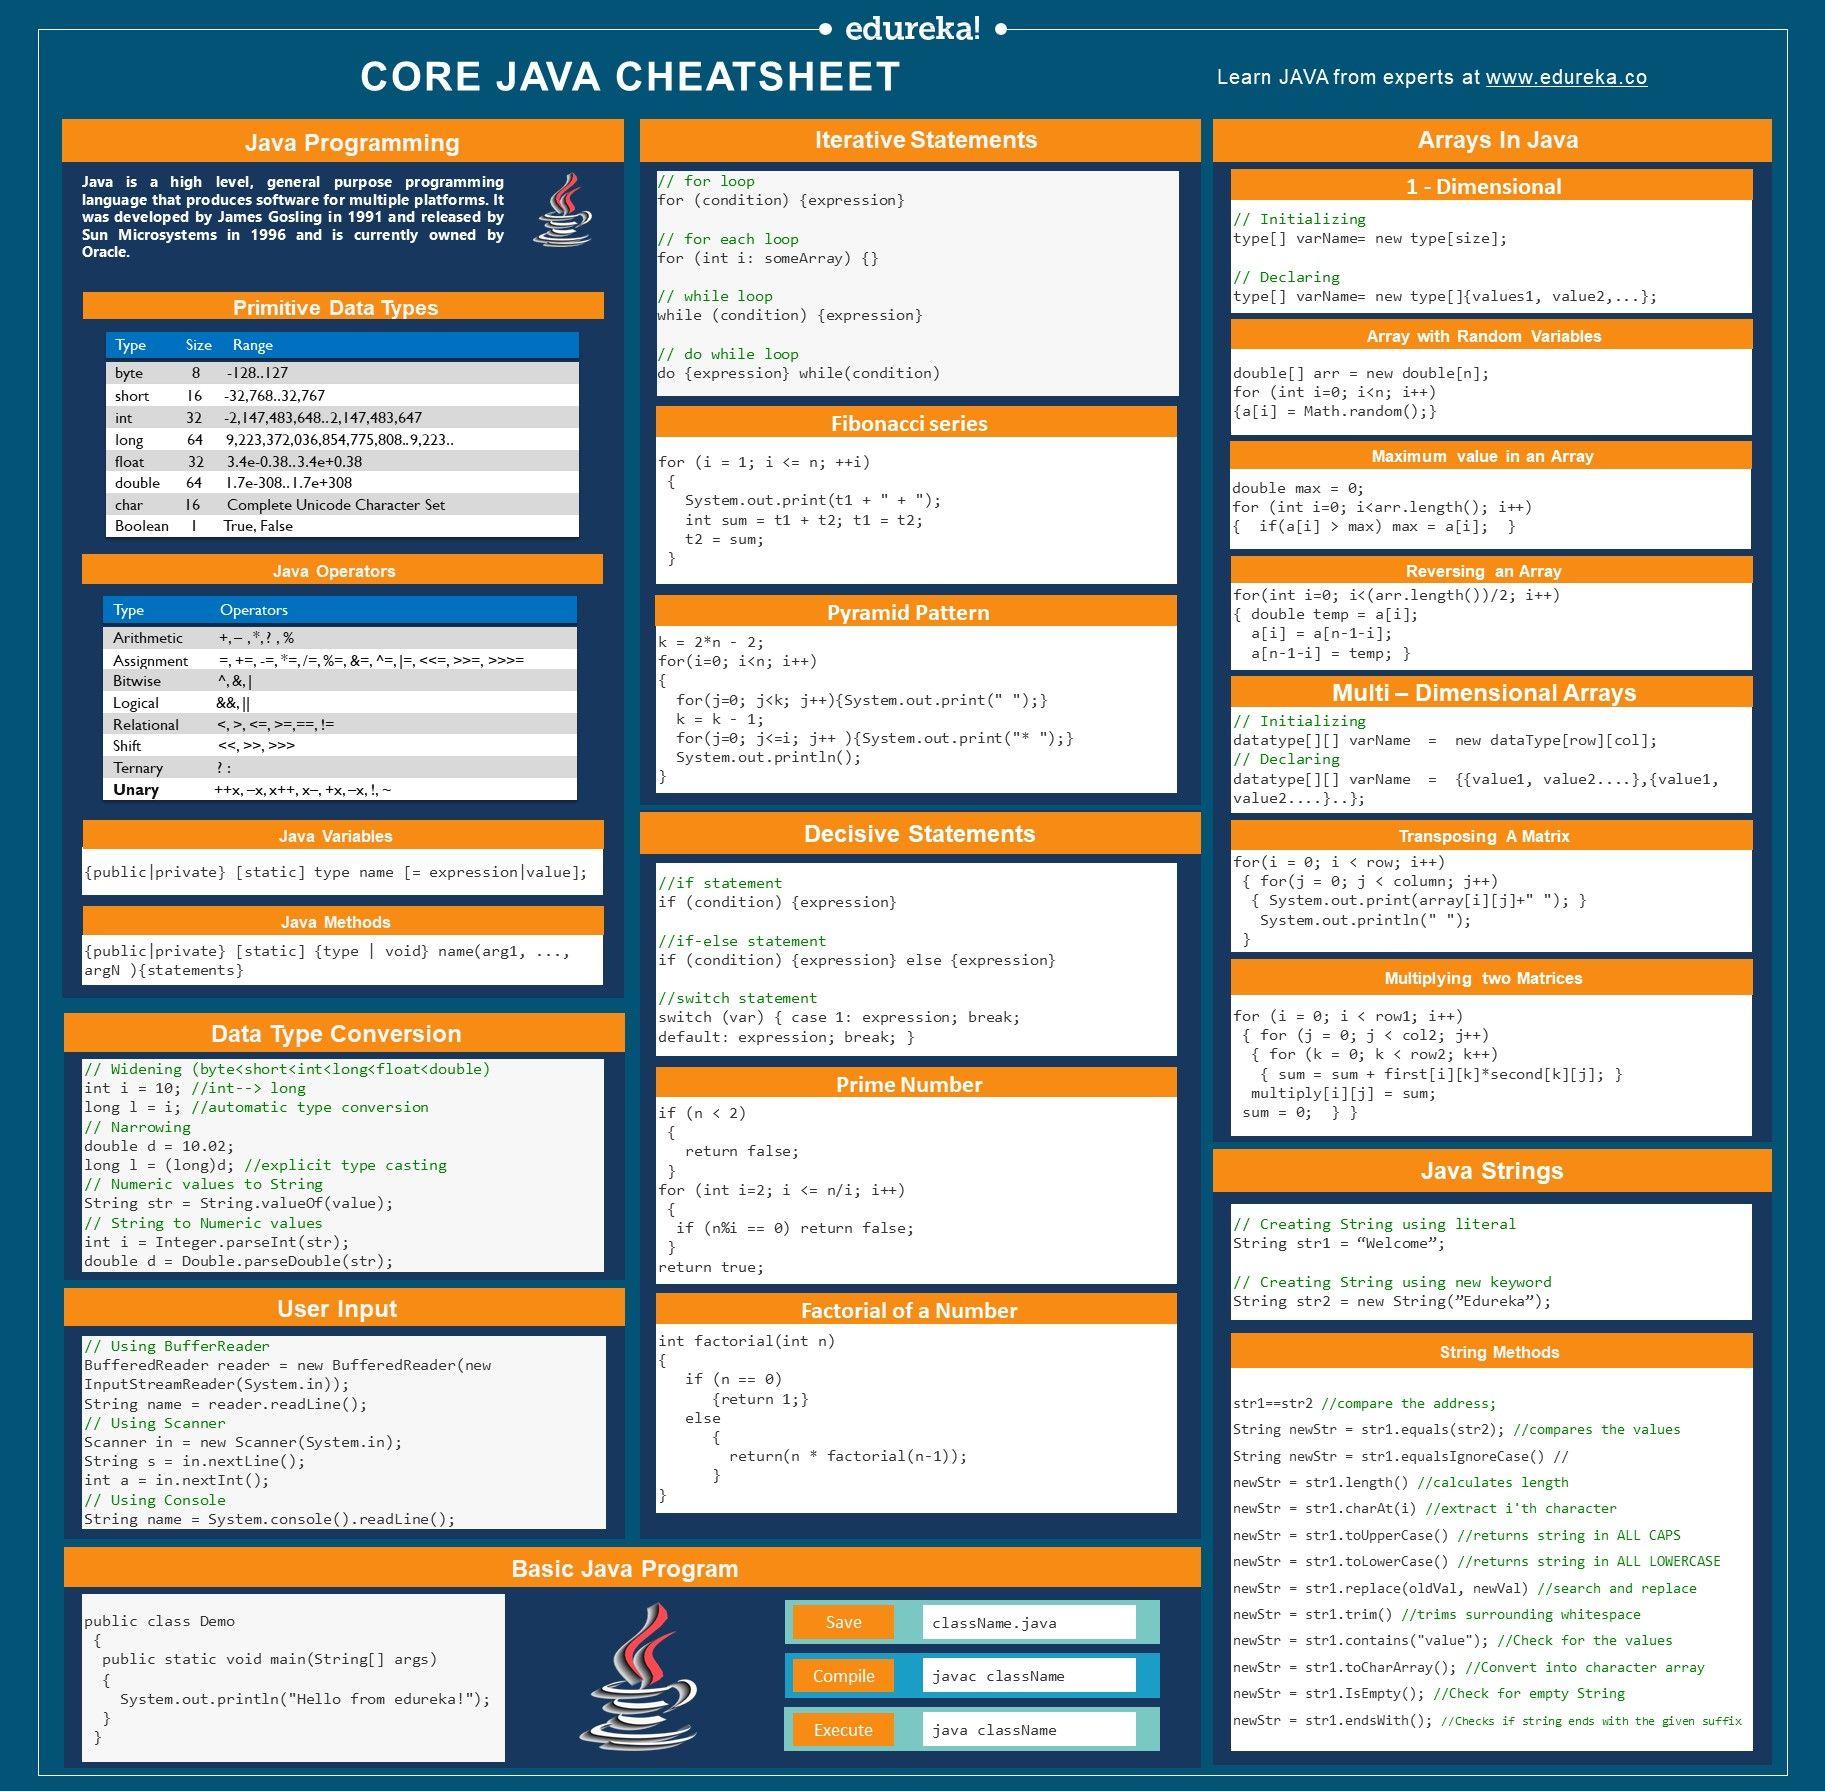 Java Cheat Sheet In